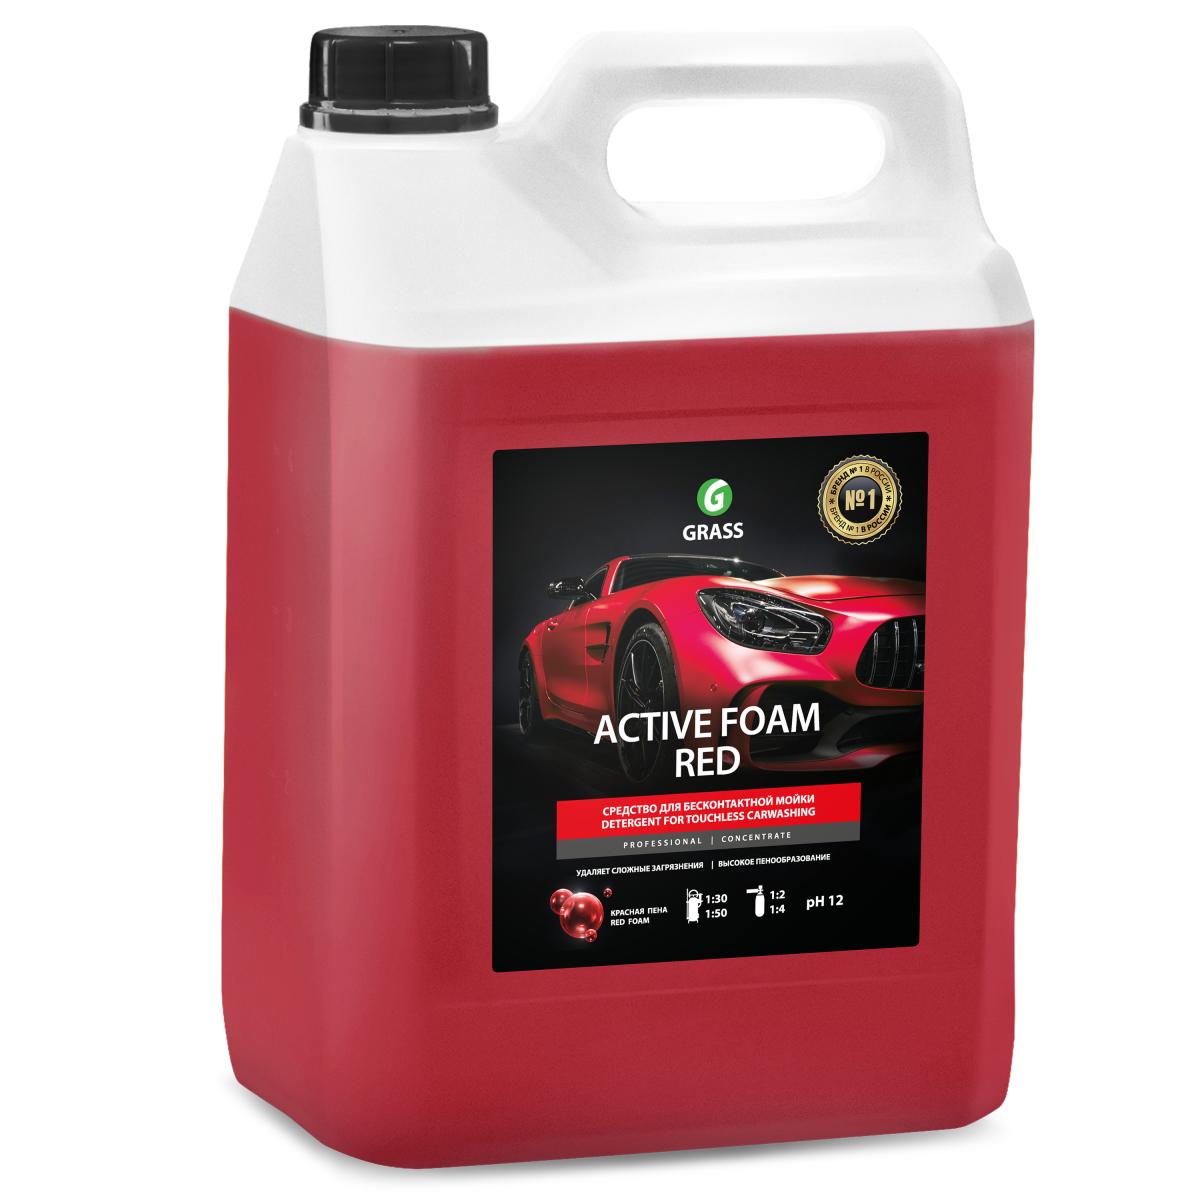 Активная пена Grass Active Foam Red 5.8 кг